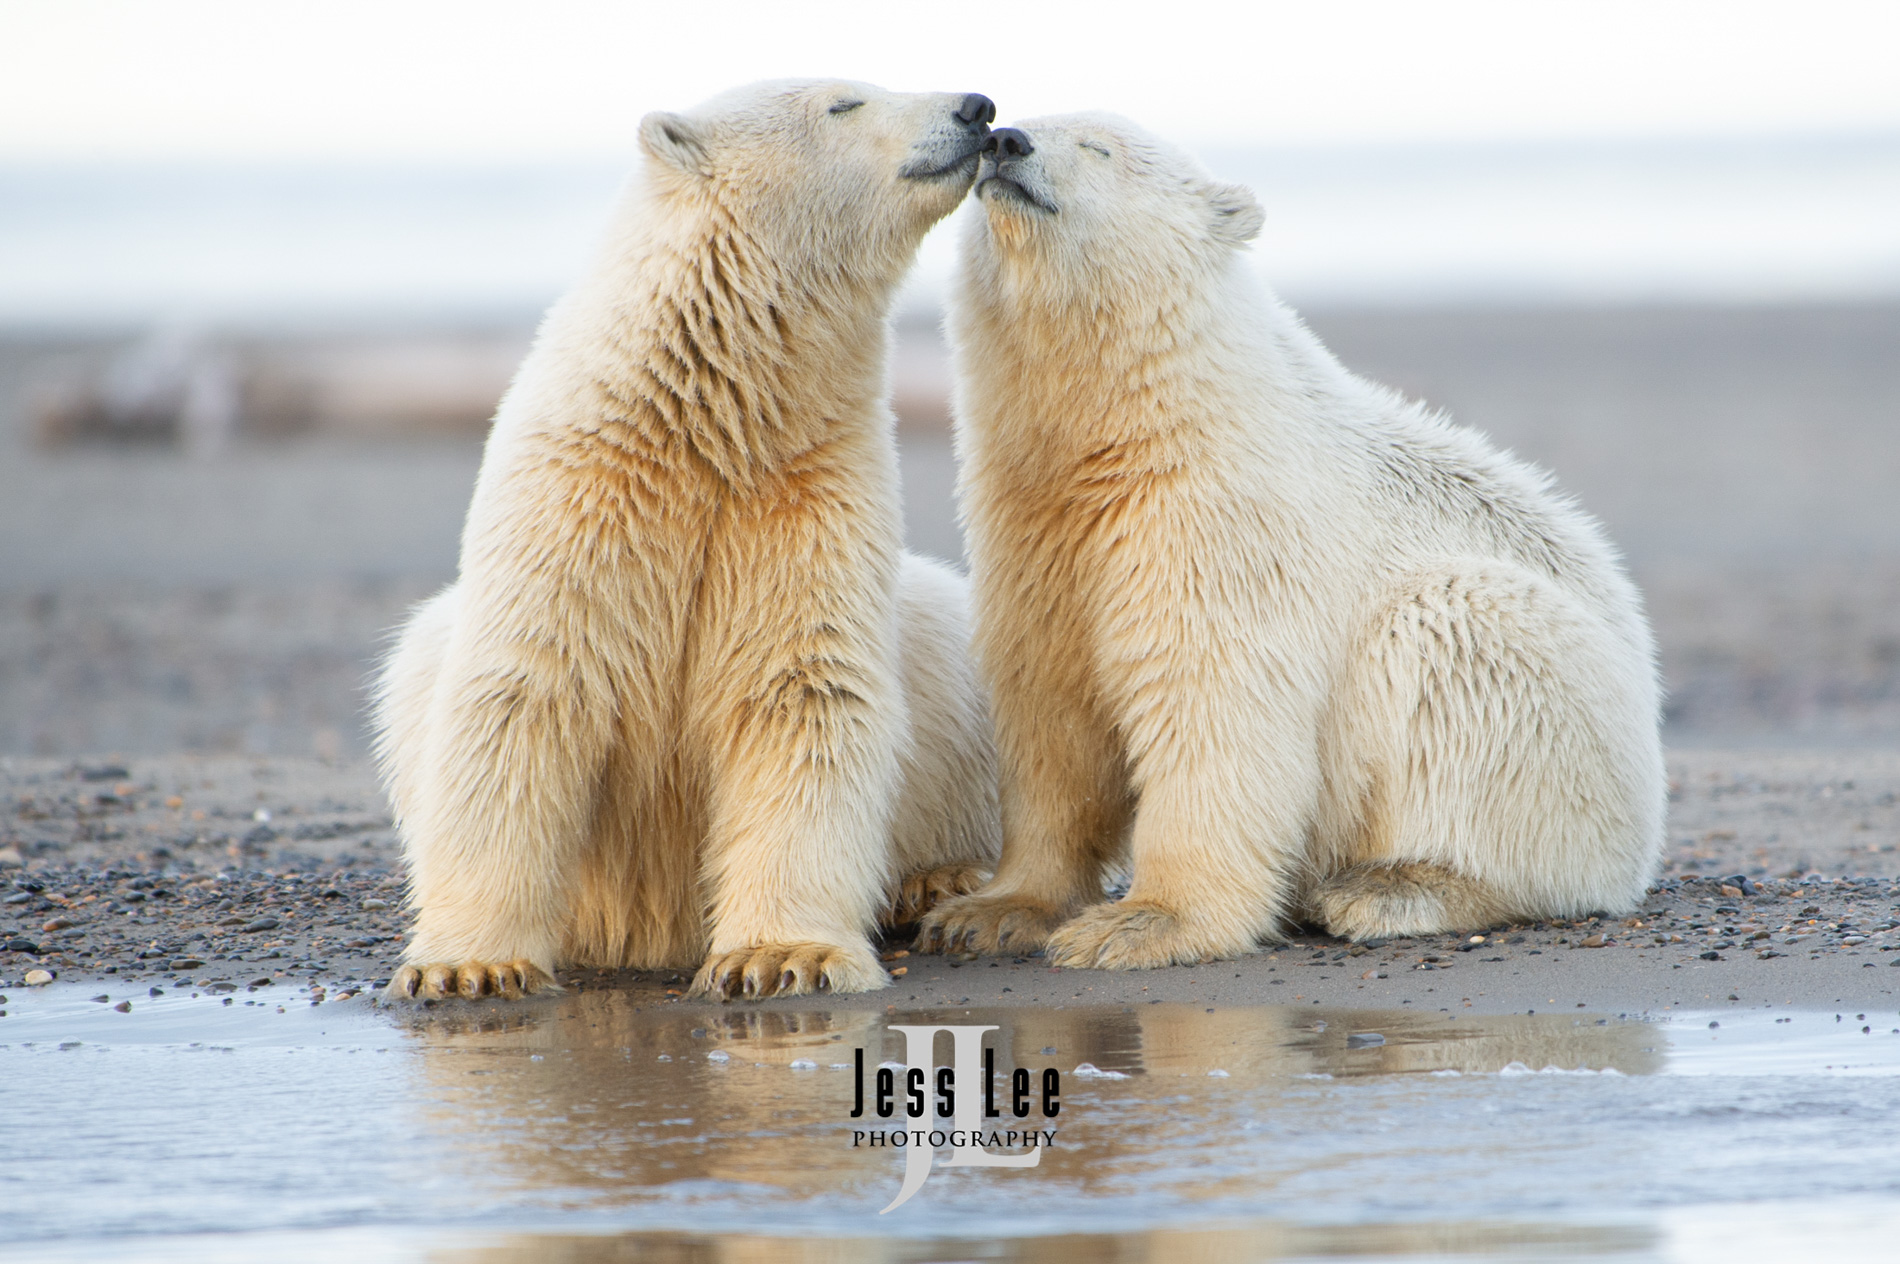 Polar bear in warming arctic, arctic National wildlife refuge, bear, bears, churchill, mammal, Alaska, marine, polar, polar bear, polar bears, ANWR,, photo